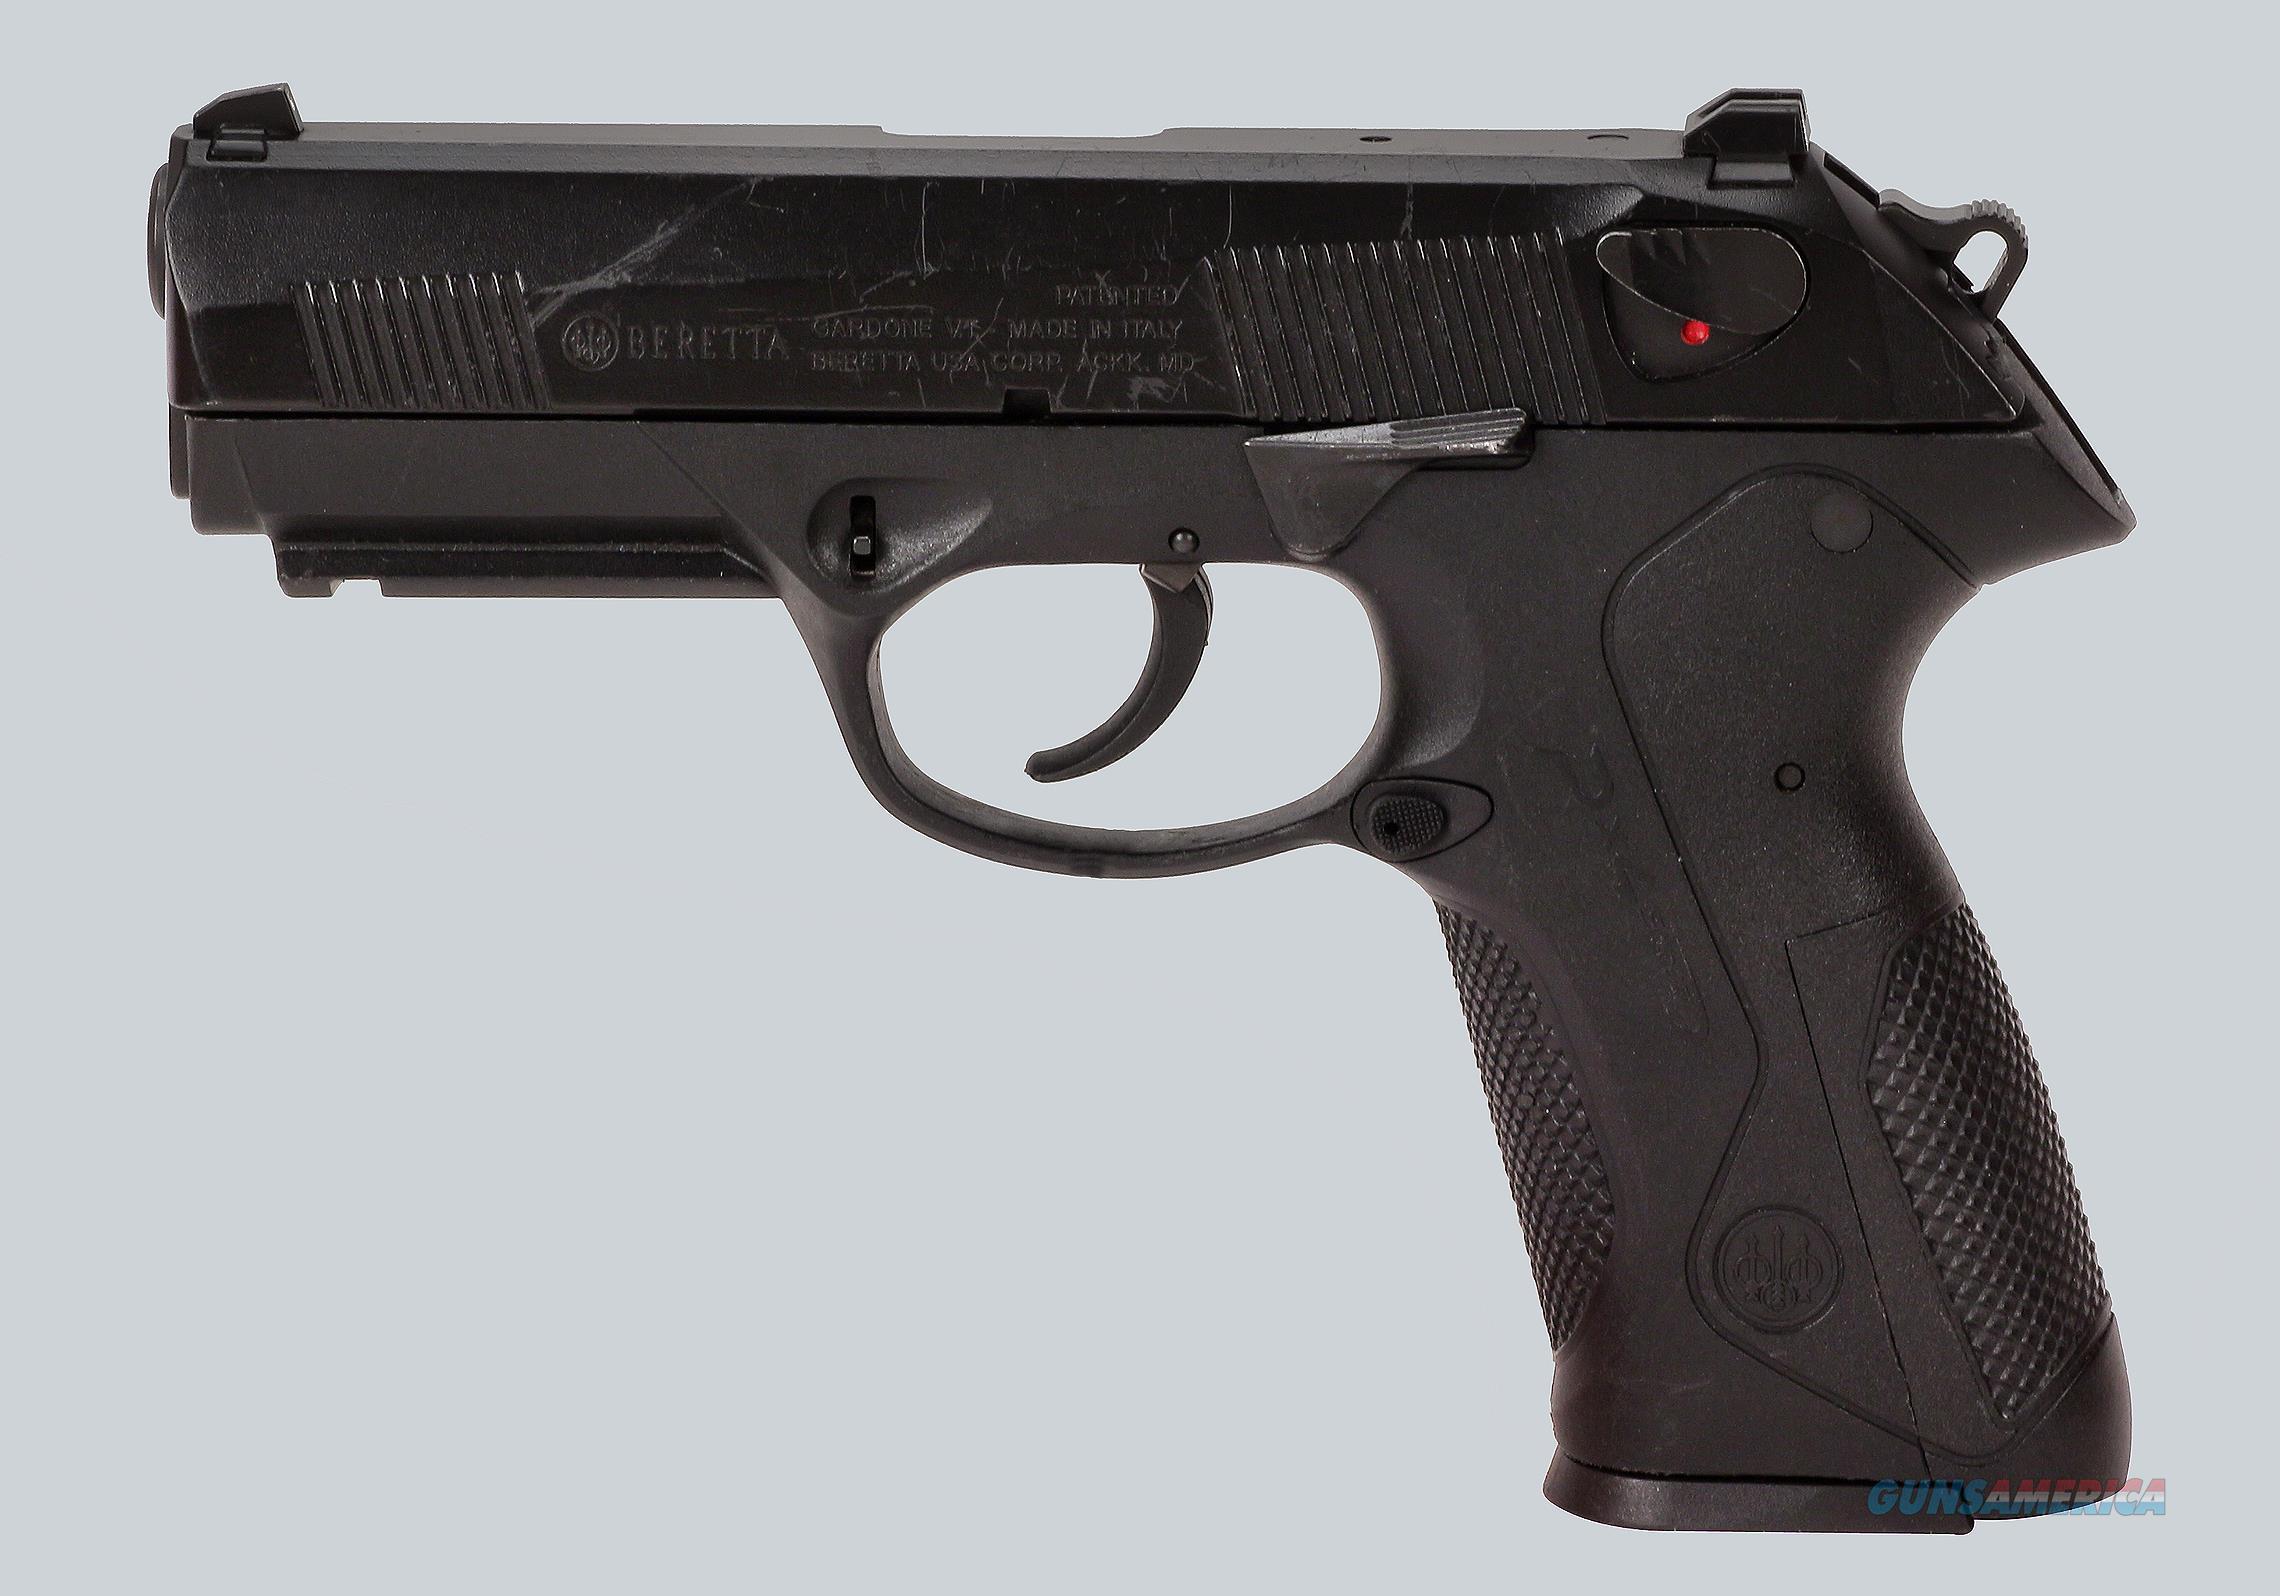 Beretta 40cal S&W Pistol  Guns > Pistols > Beretta Pistols > Polymer Frame